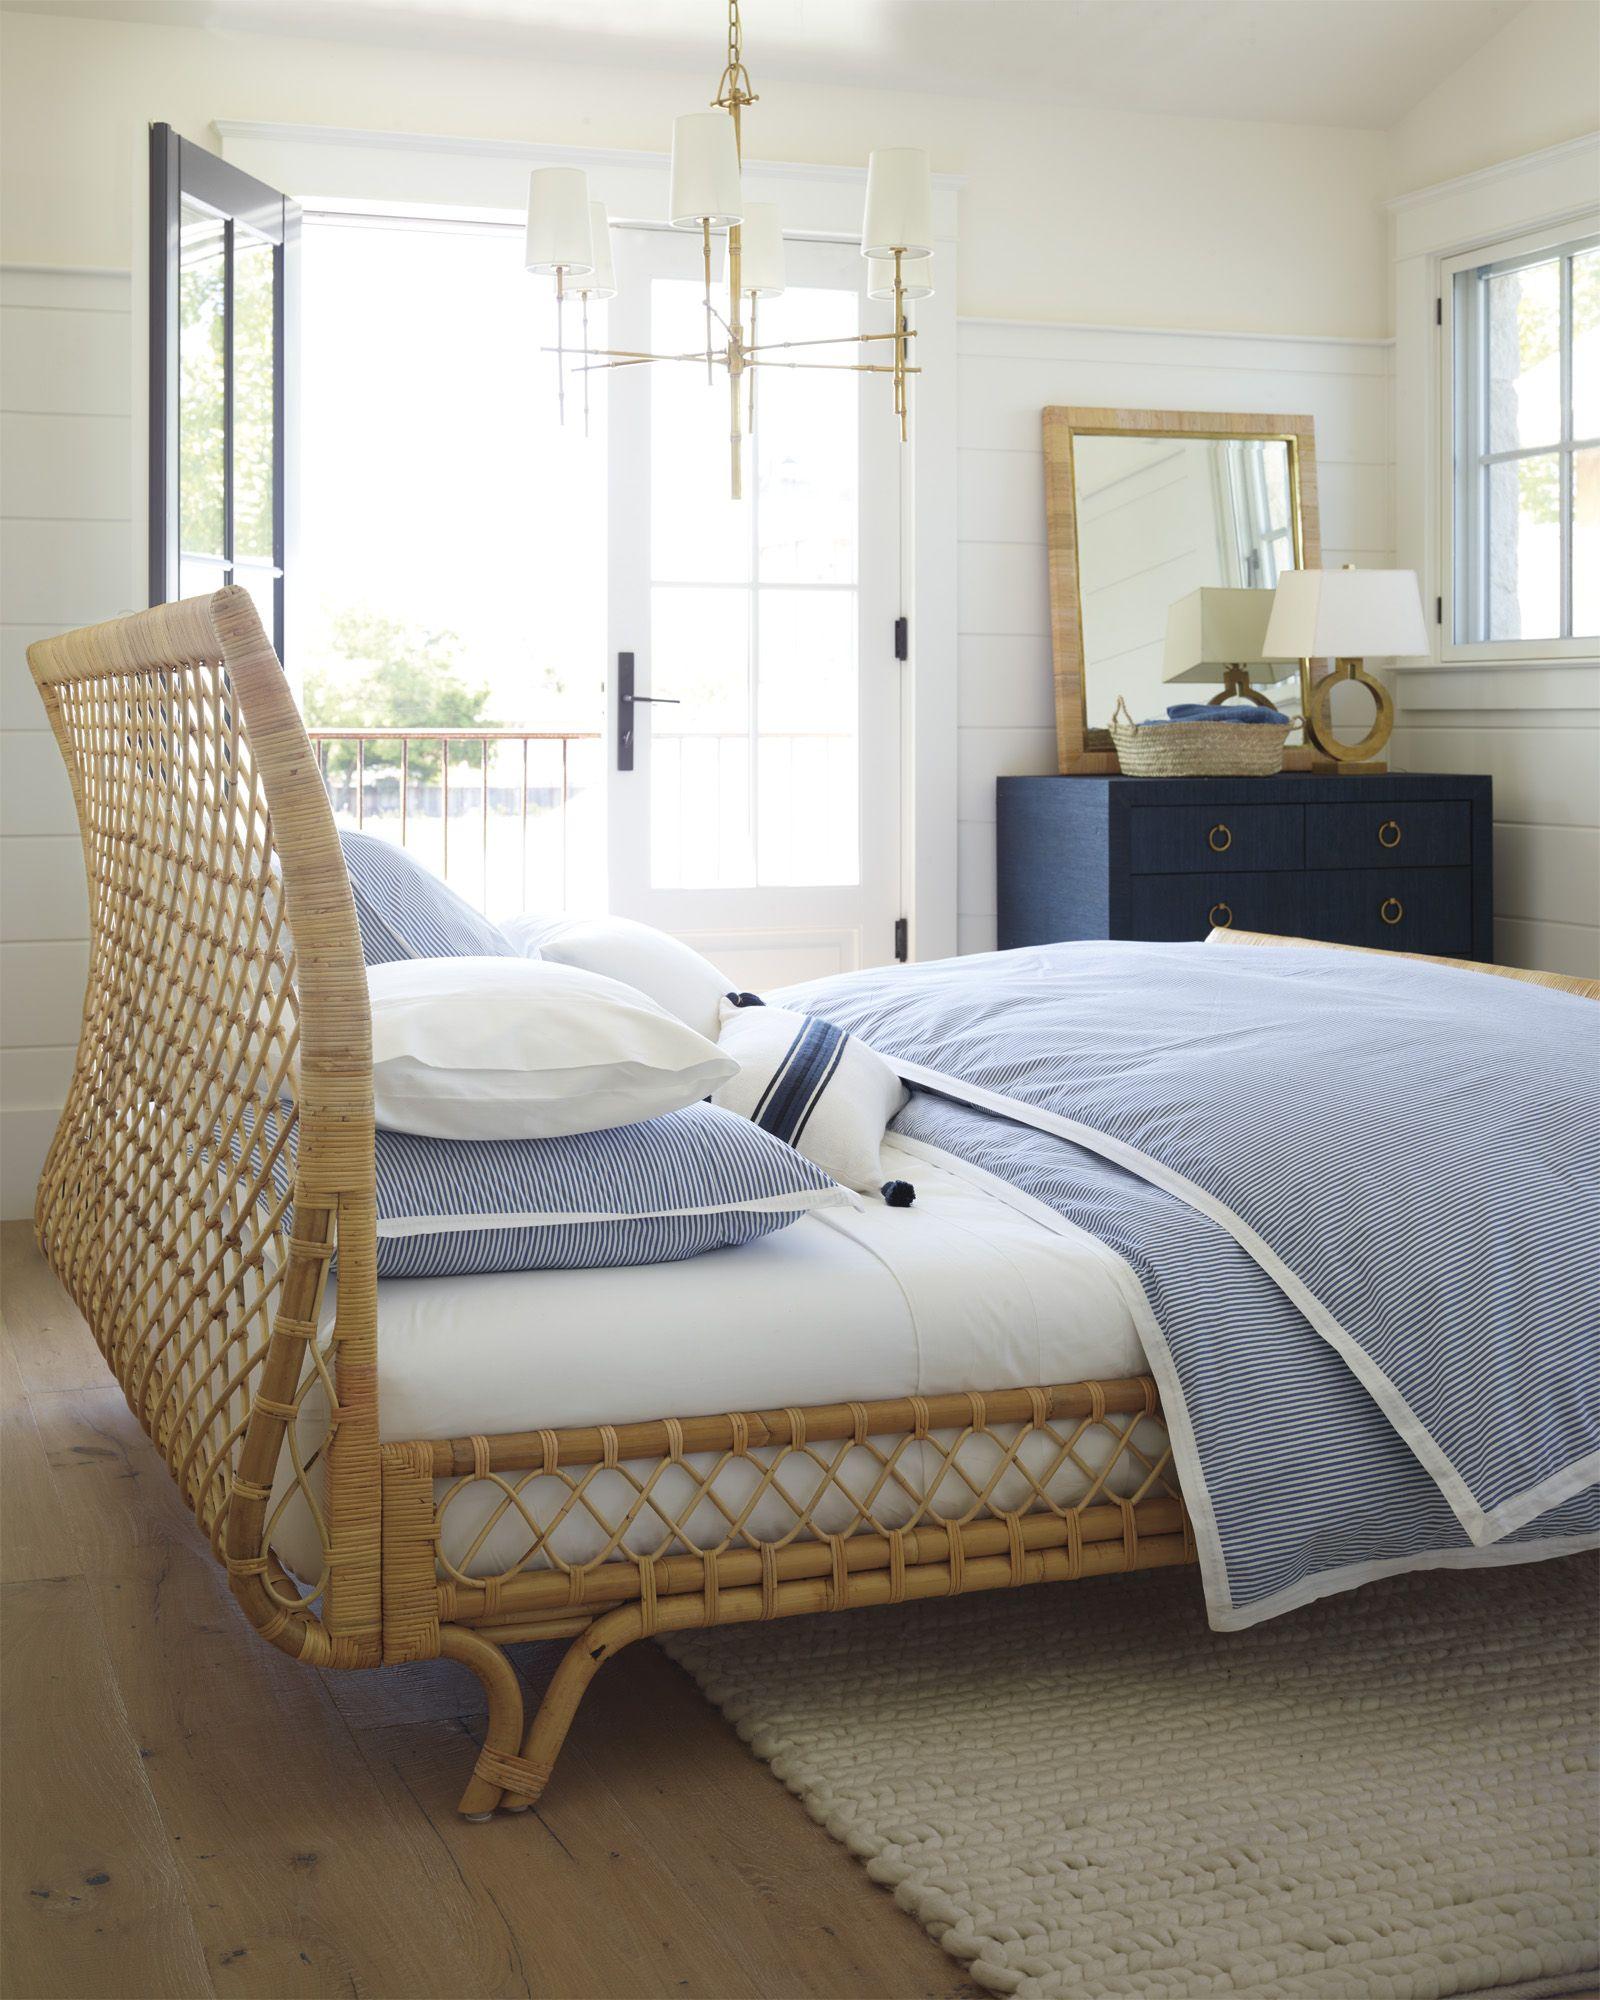 3 Kind Of Elegant Bedroom Design Ideas Includes A: Pin On Coastal Bedrooms